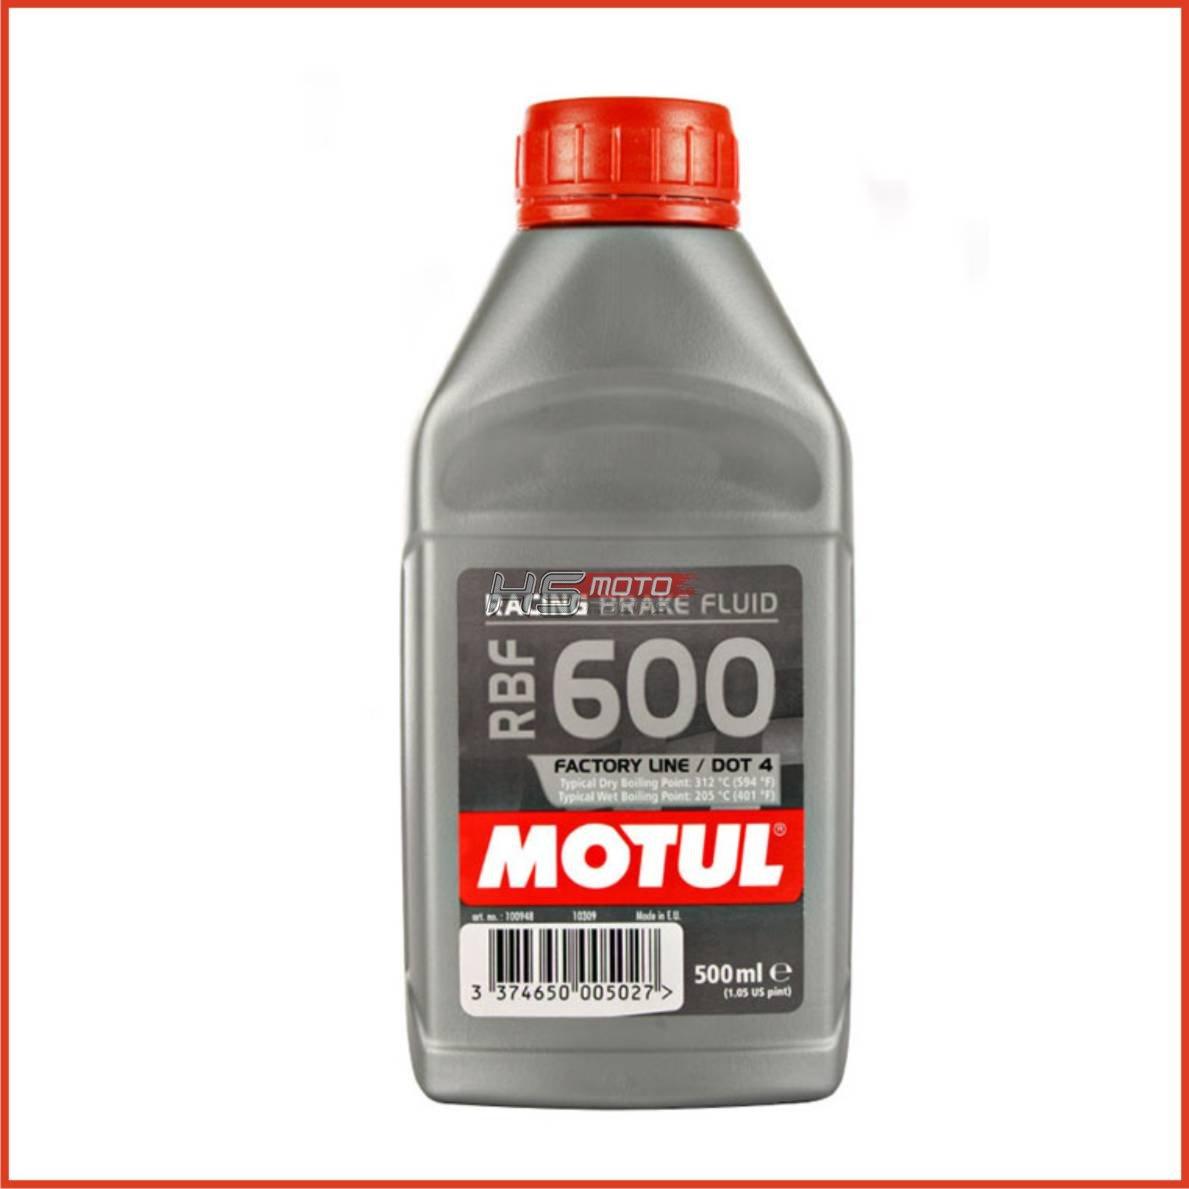 Dot 5 1 Brake Fluid >> Motul Brake Fluid Factory Line RBF 600